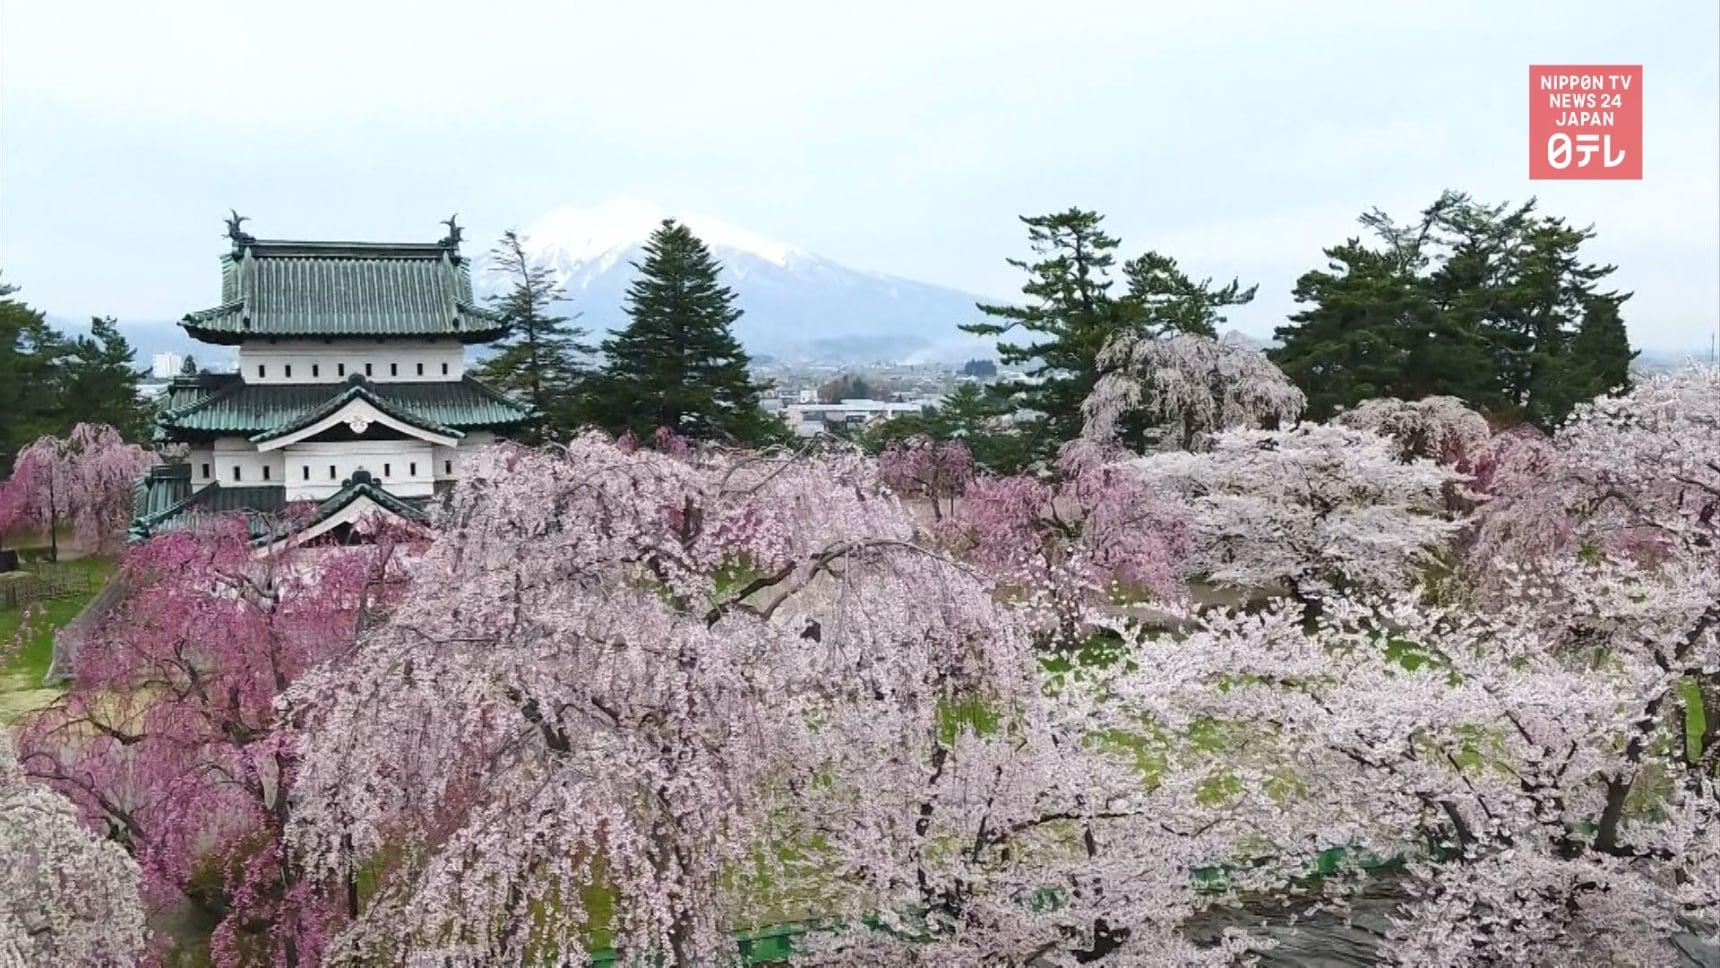 Aomori's Hirosaki Park Reopens